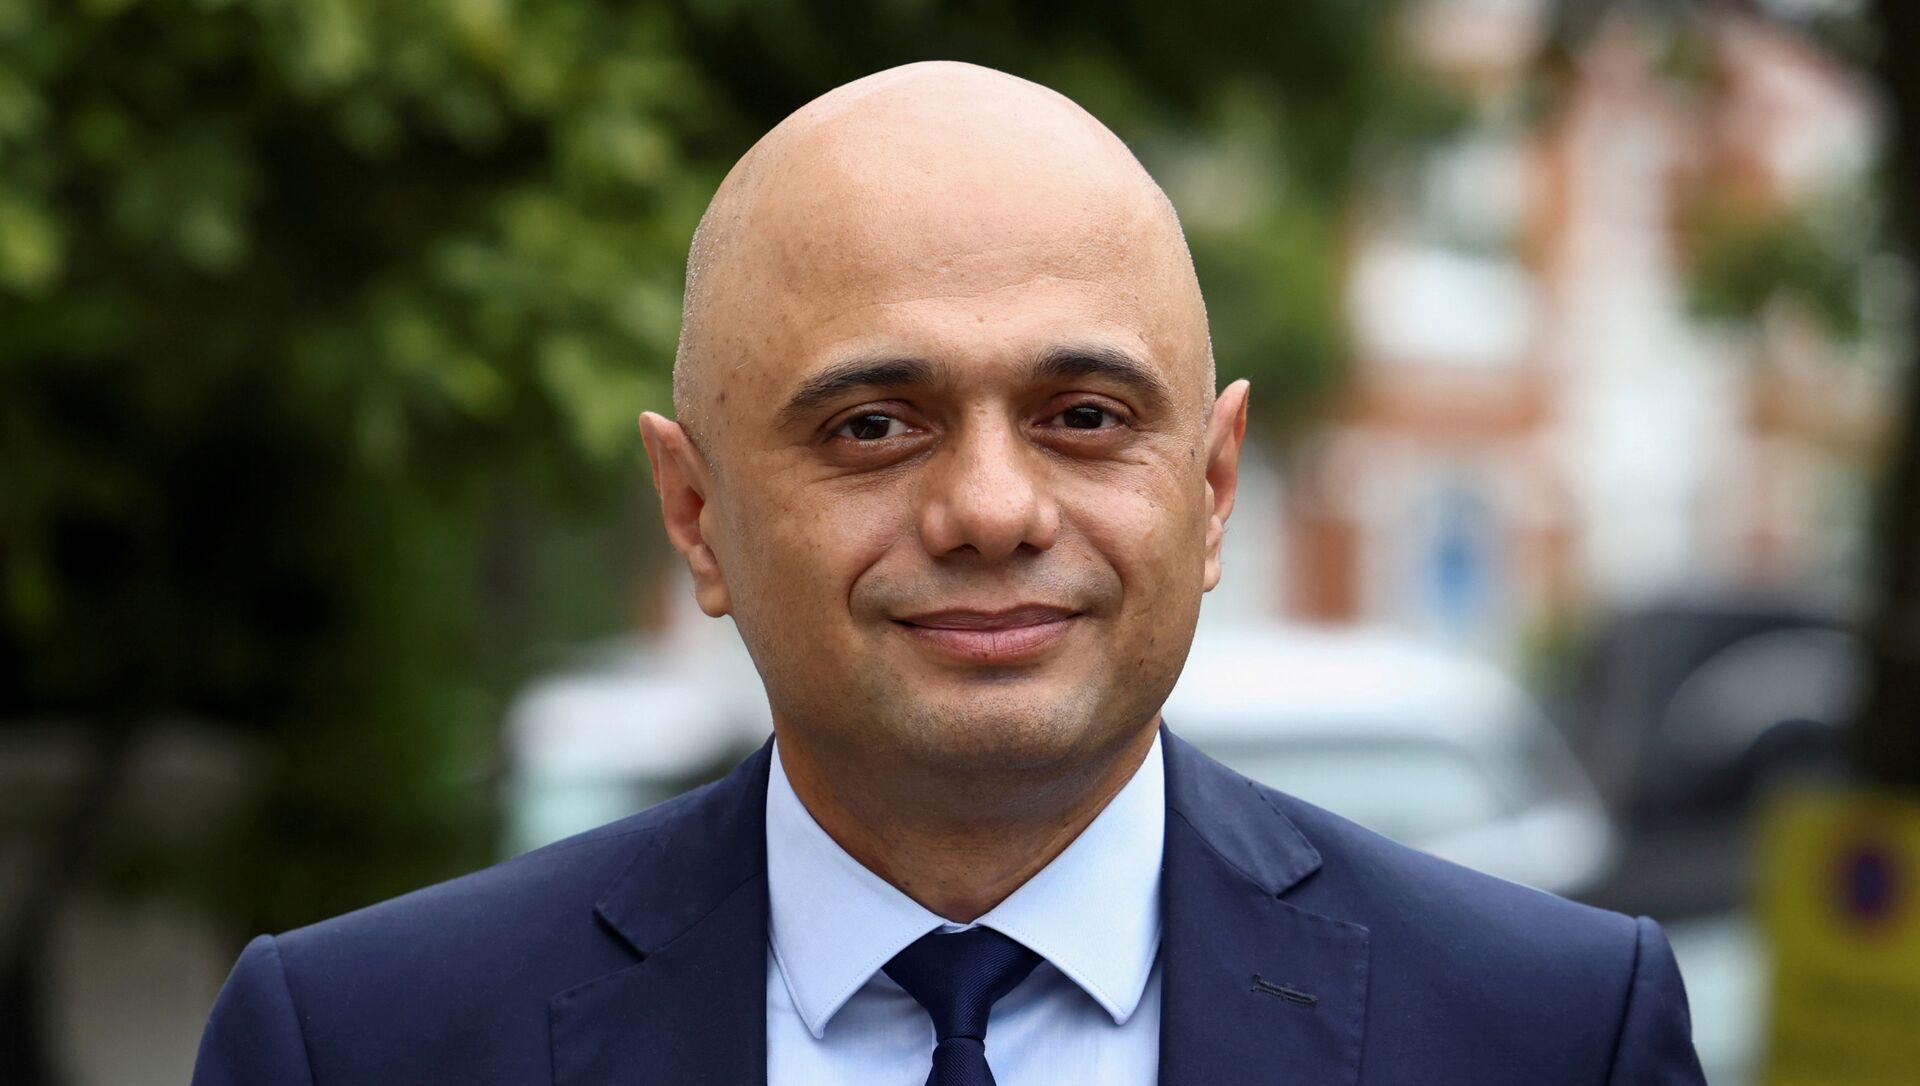 Britain's new Health Secretary Sajid Javid walks outside his home in London, Britain June 27, 2021. - Sputnik International, 1920, 25.07.2021